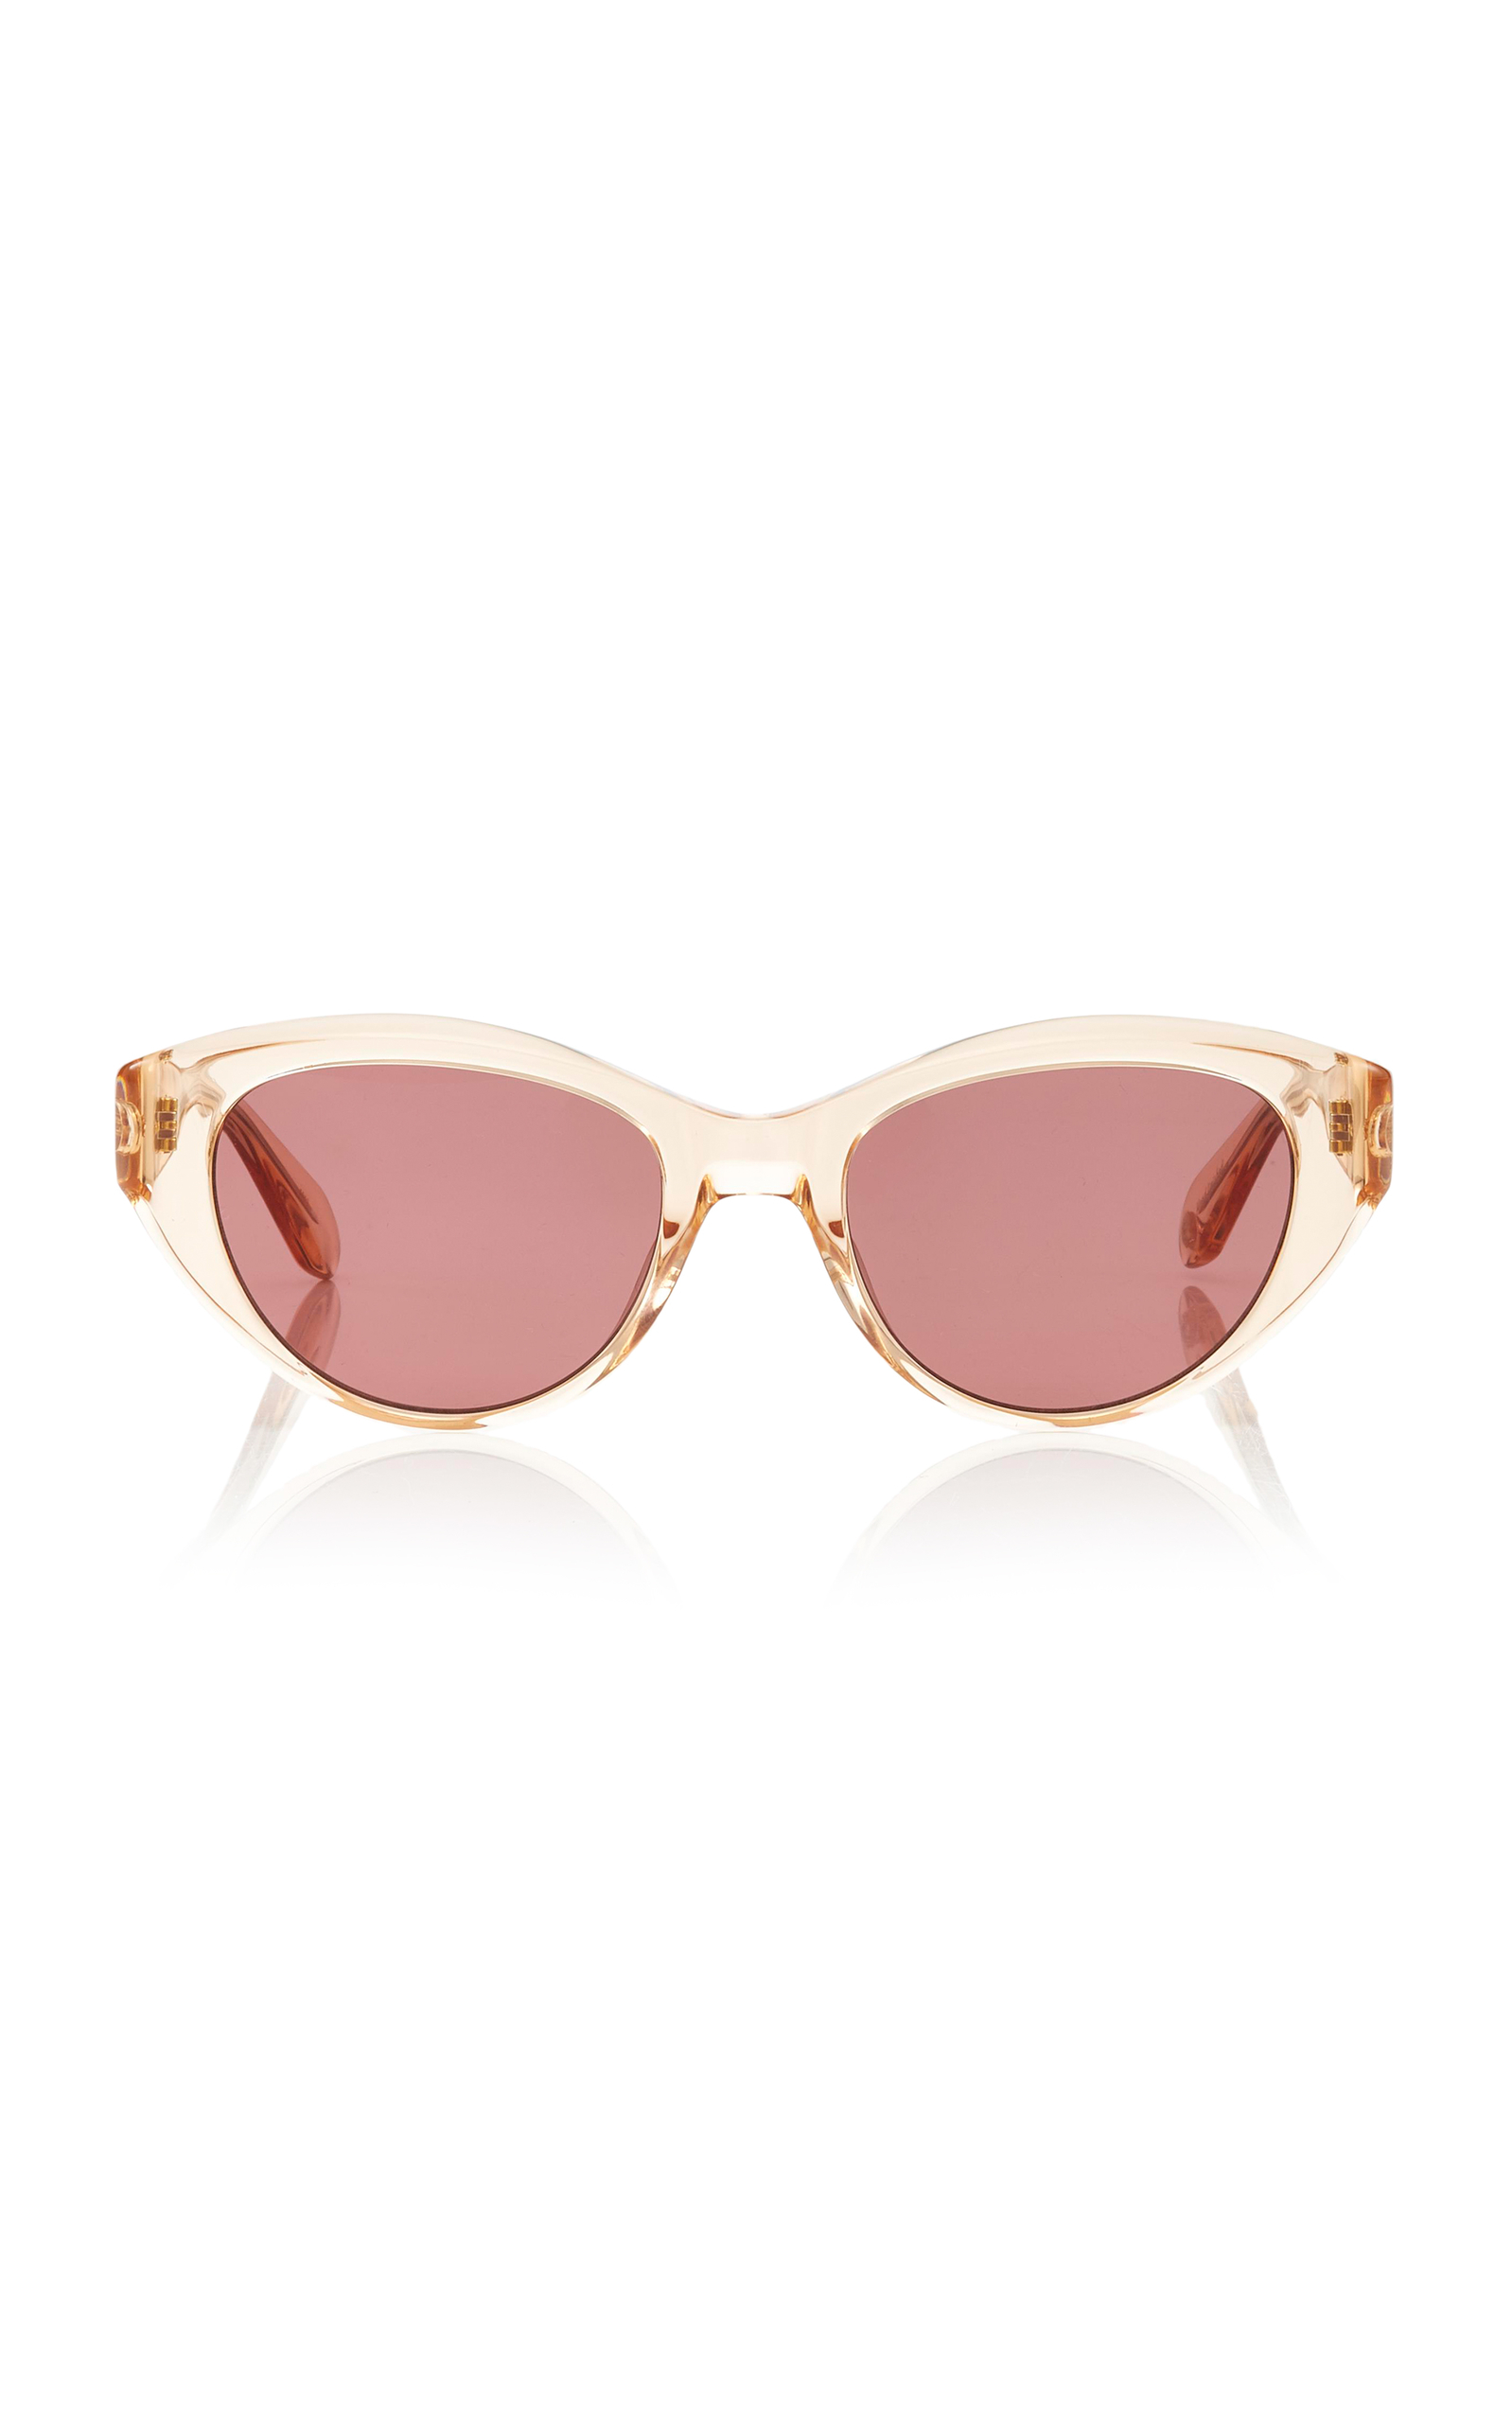 Del Rey 50 Cat-Eye Acetate Sunglasses Garrett Leight SLnLzI4I8